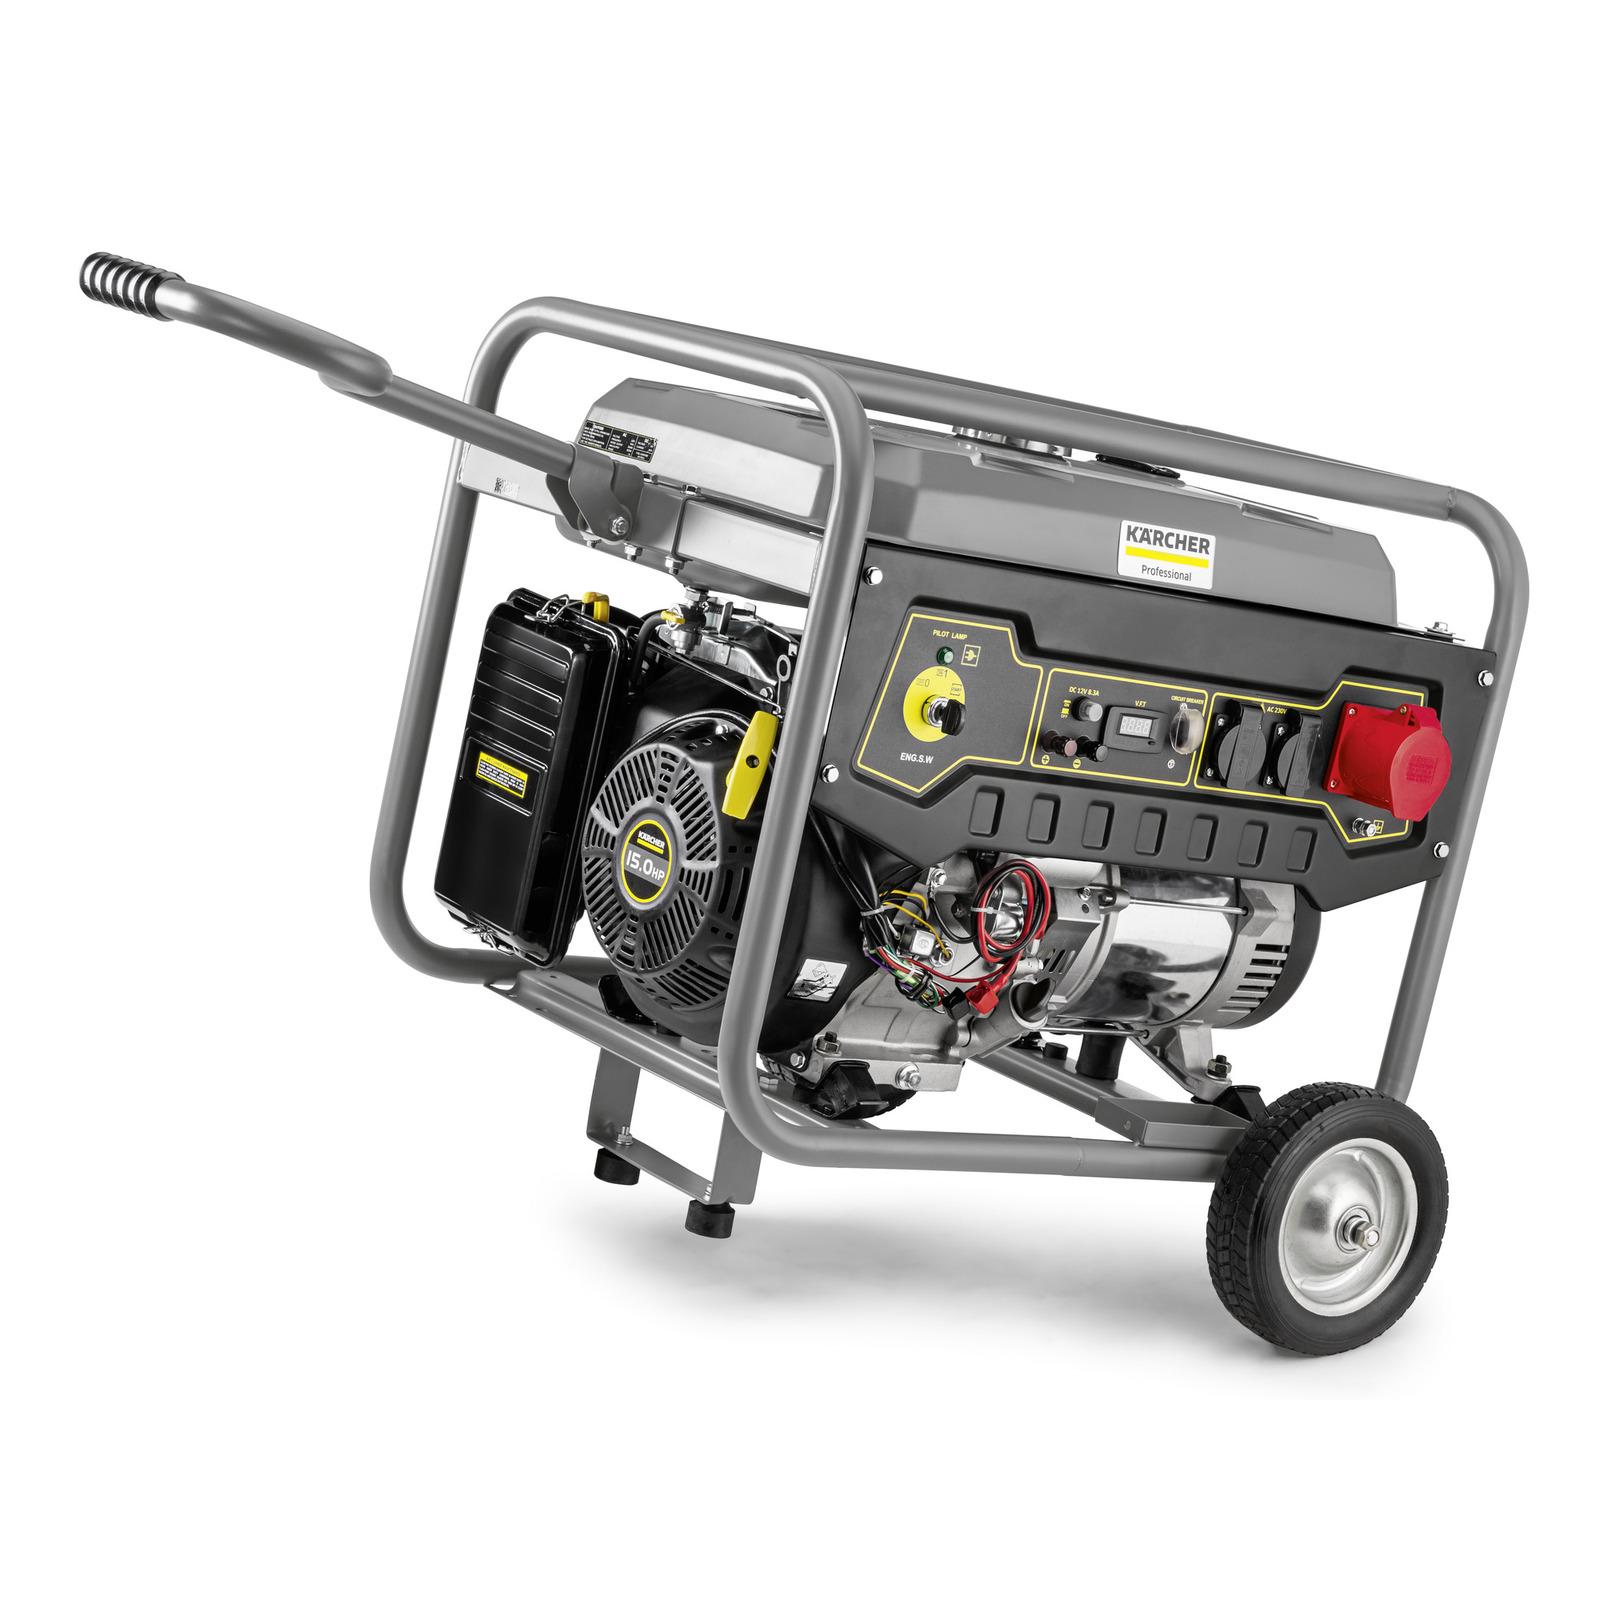 Karcher_1.042-209.0_PGG 8-3 Generator 1 - PGG 8/3 Generator